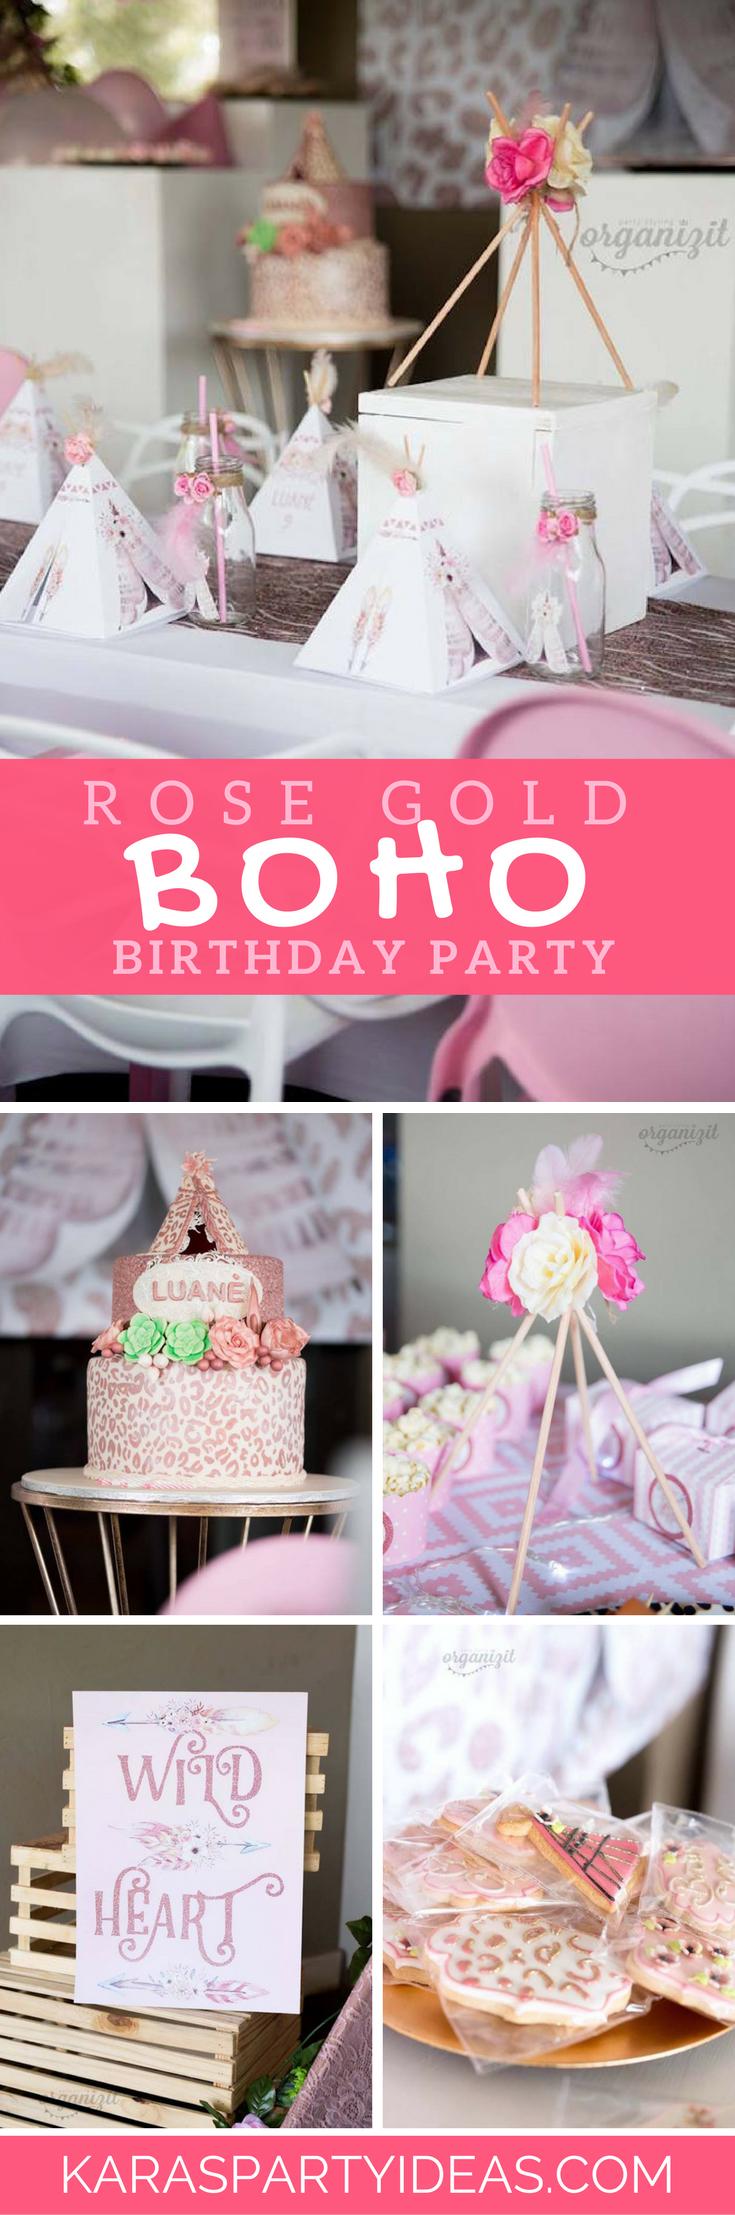 Rose Gold Boho Birthday Party via Kara's Party Ideas - KarasPartyIdeas.com